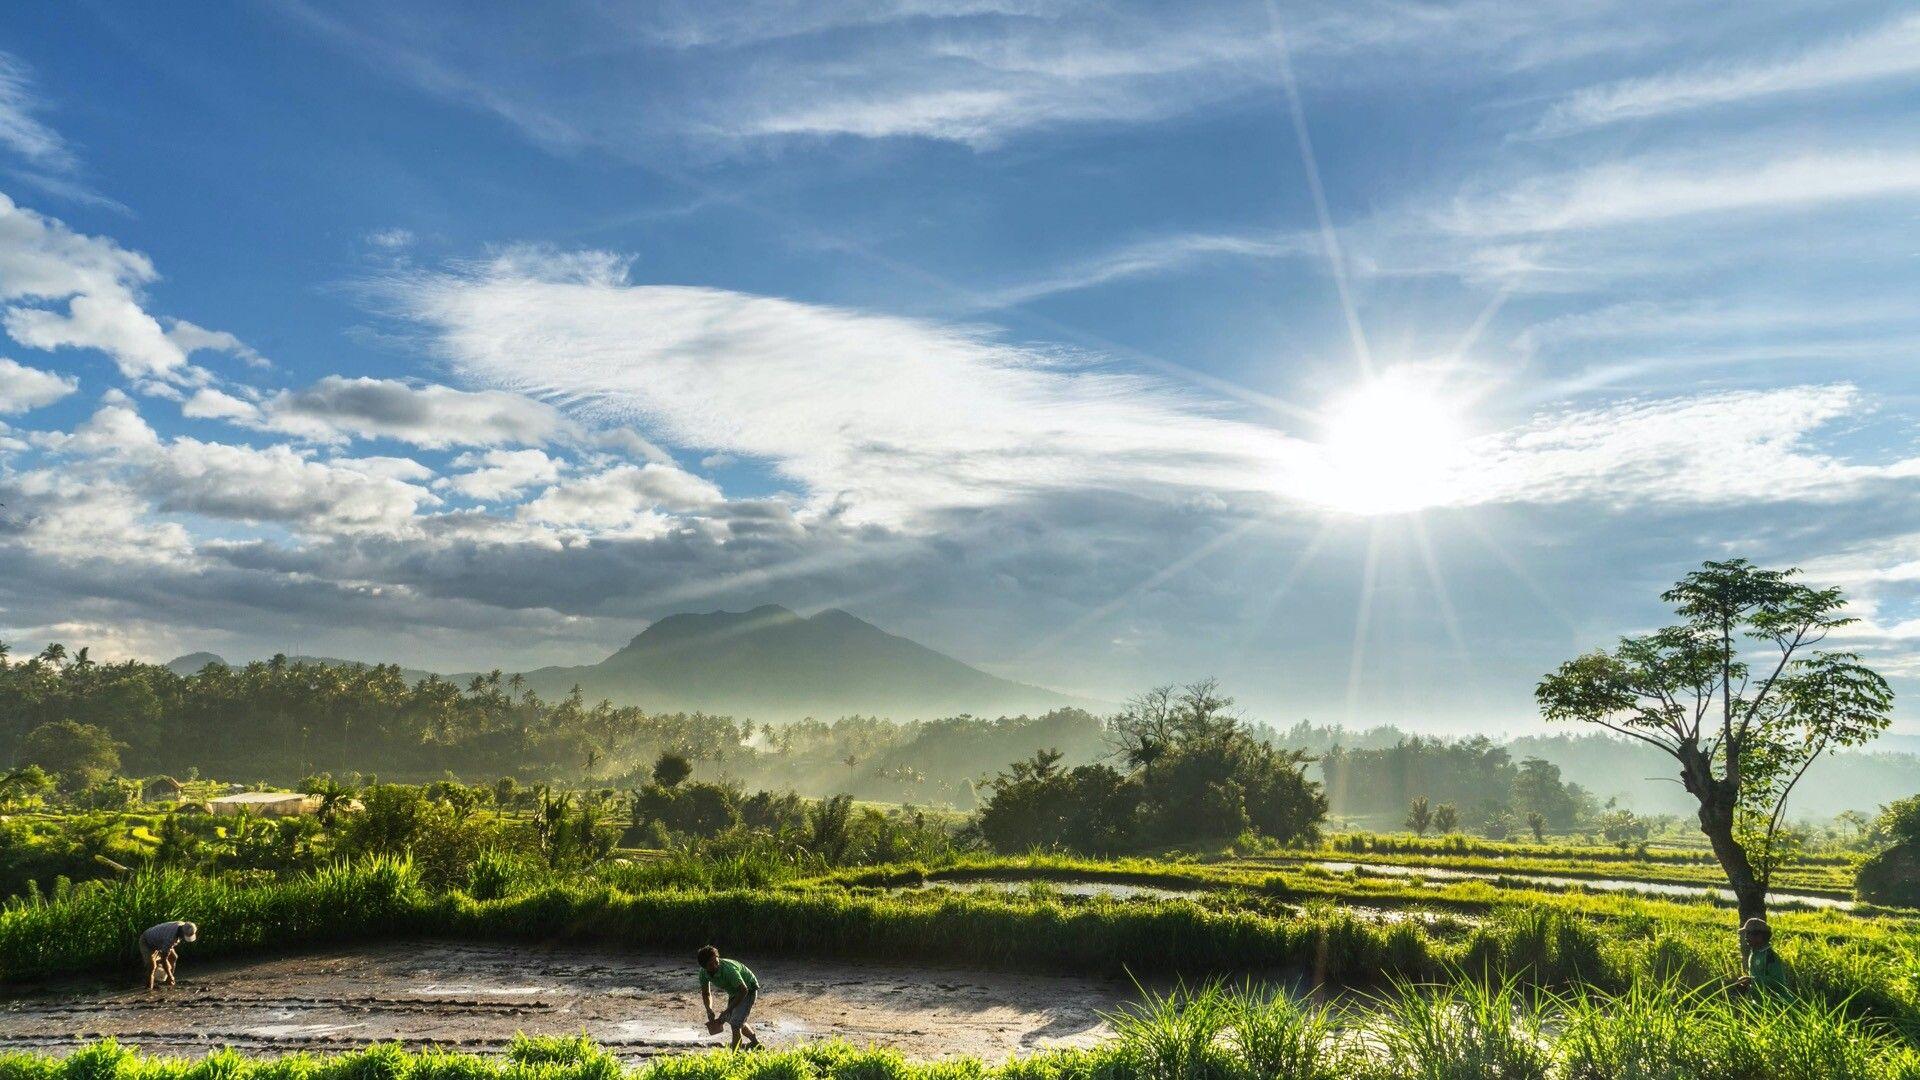 巴厘岛稻田风光高清动态壁纸 natural landmarks nature landmarks